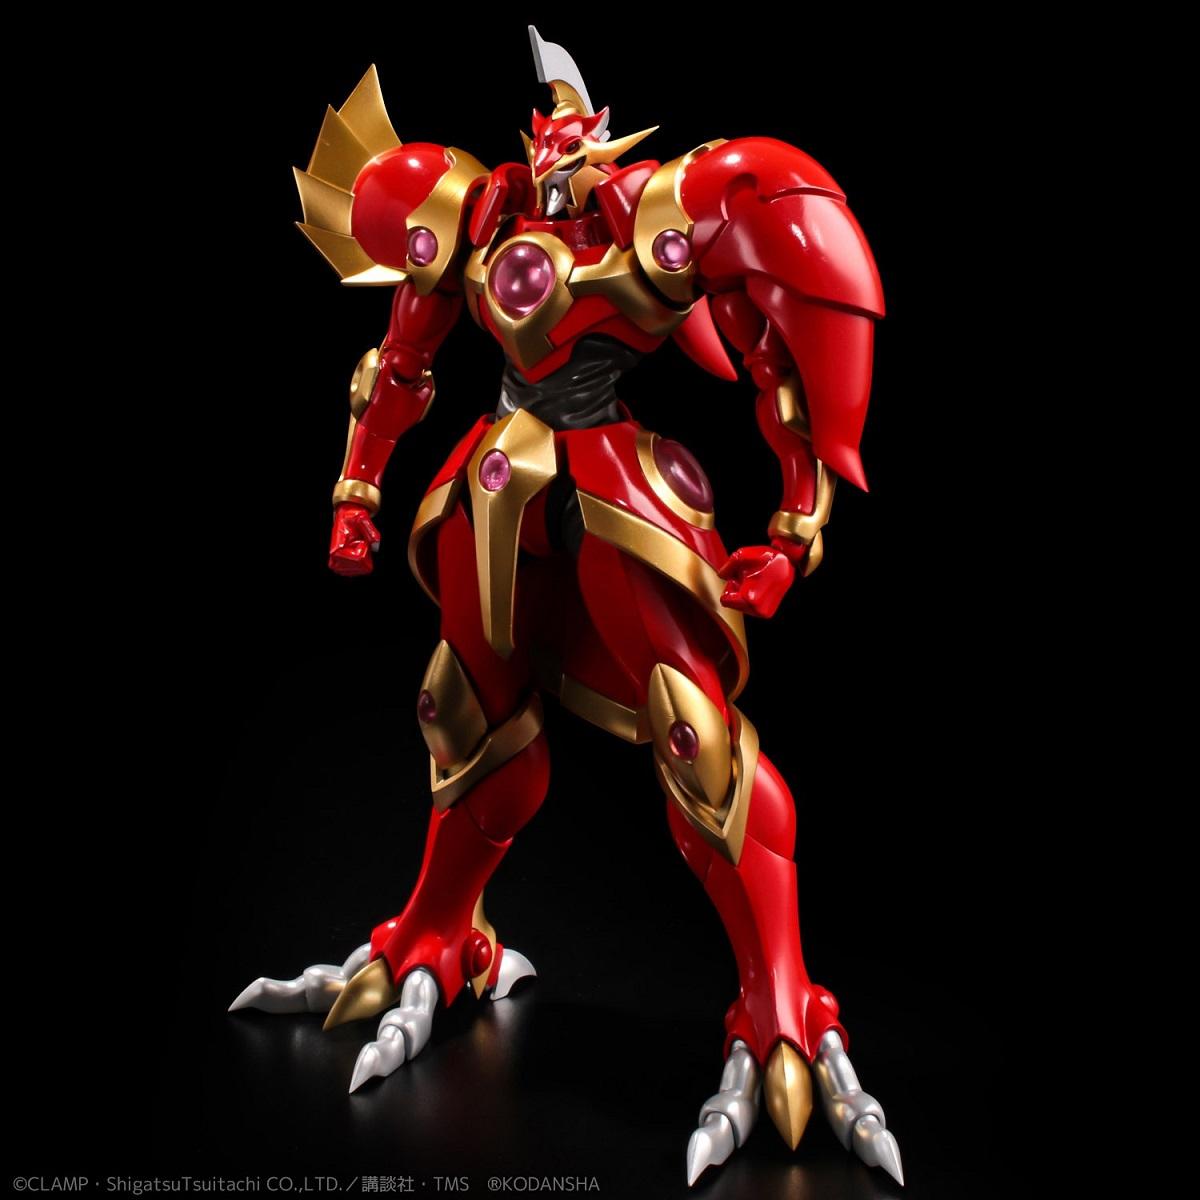 Rayearth Magic Knight Rayearth Riobot Figure